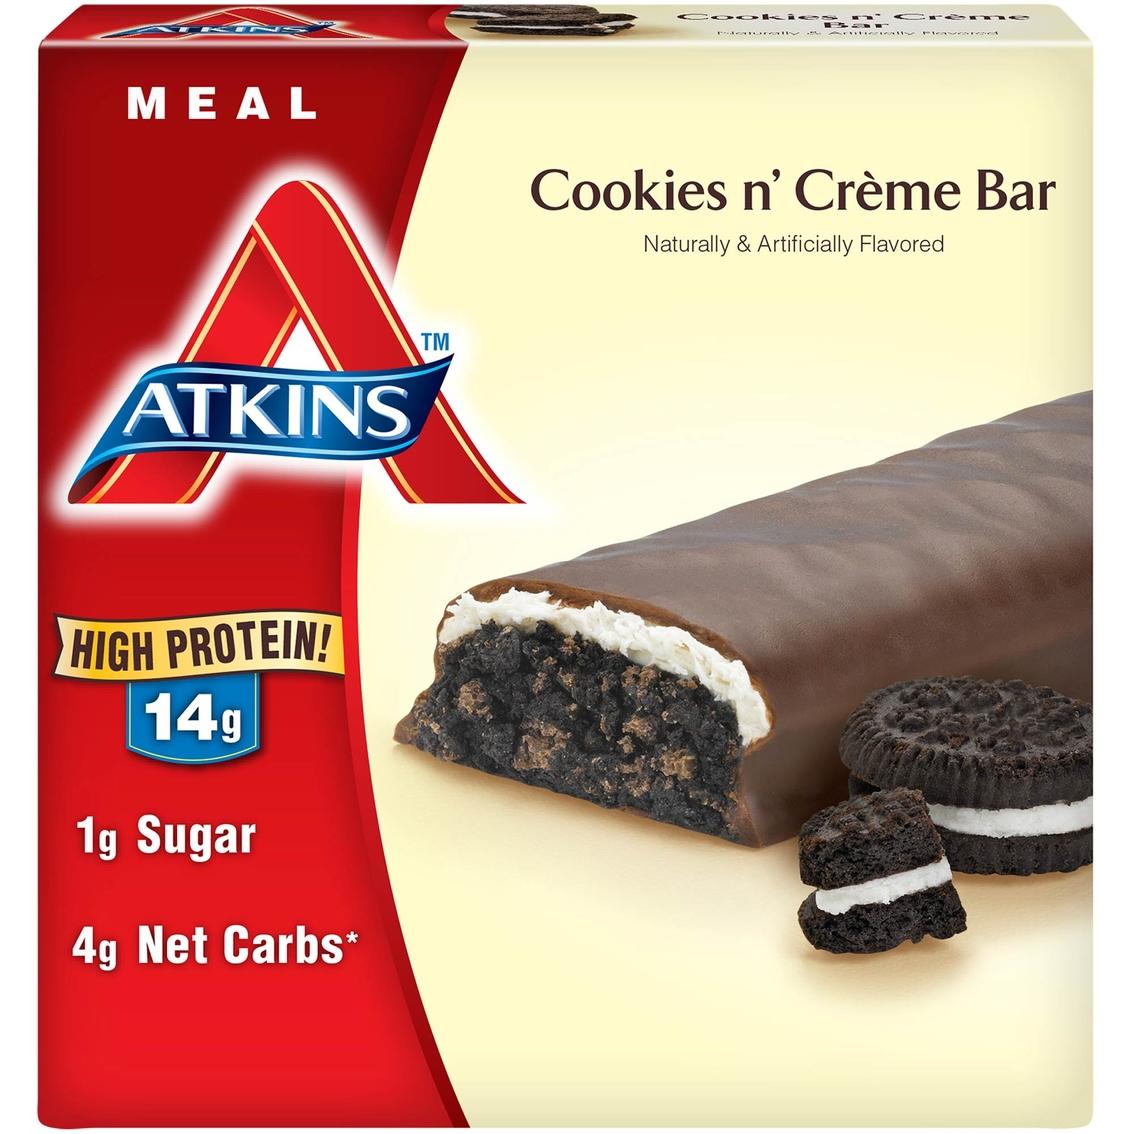 Atkins diet cookies